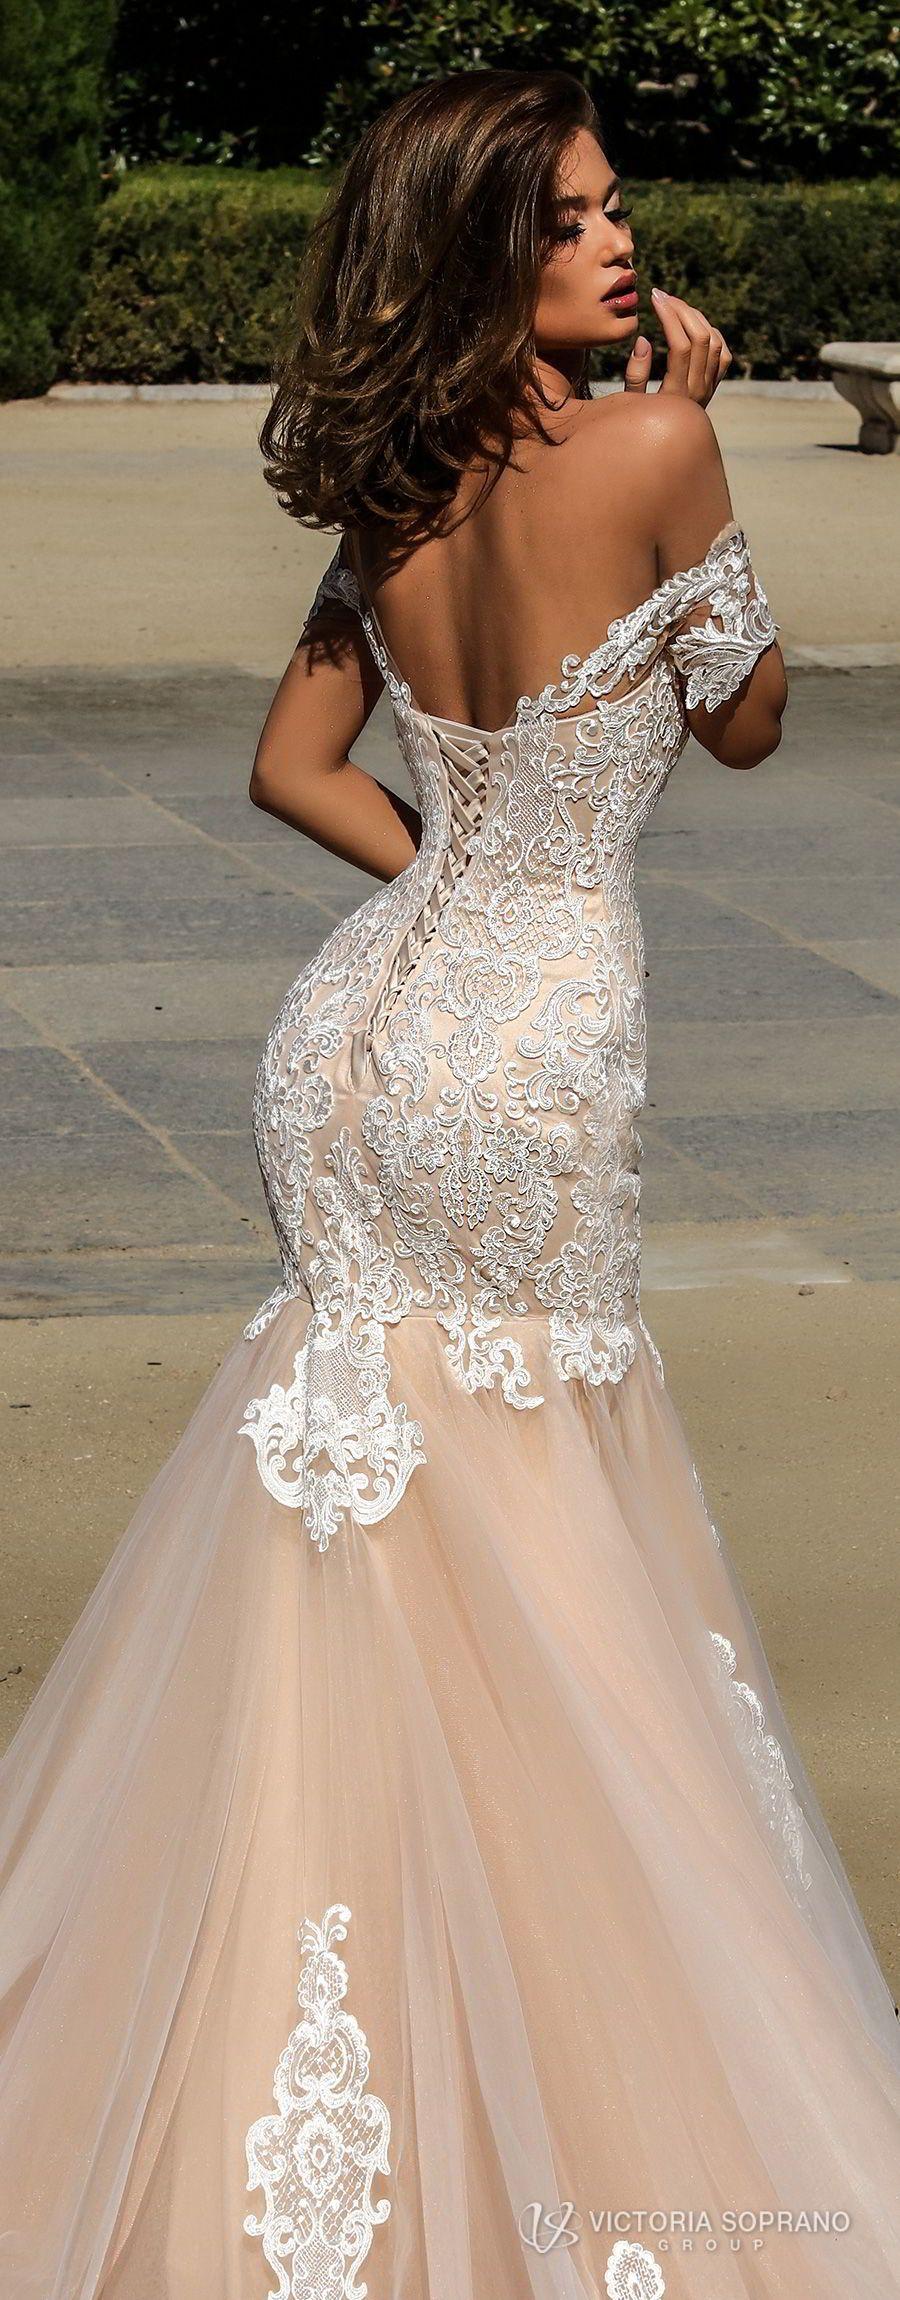 Blush mermaid wedding dress  Victoria Soprano  Wedding Dresses u ucThe Oneud Bridal Collection